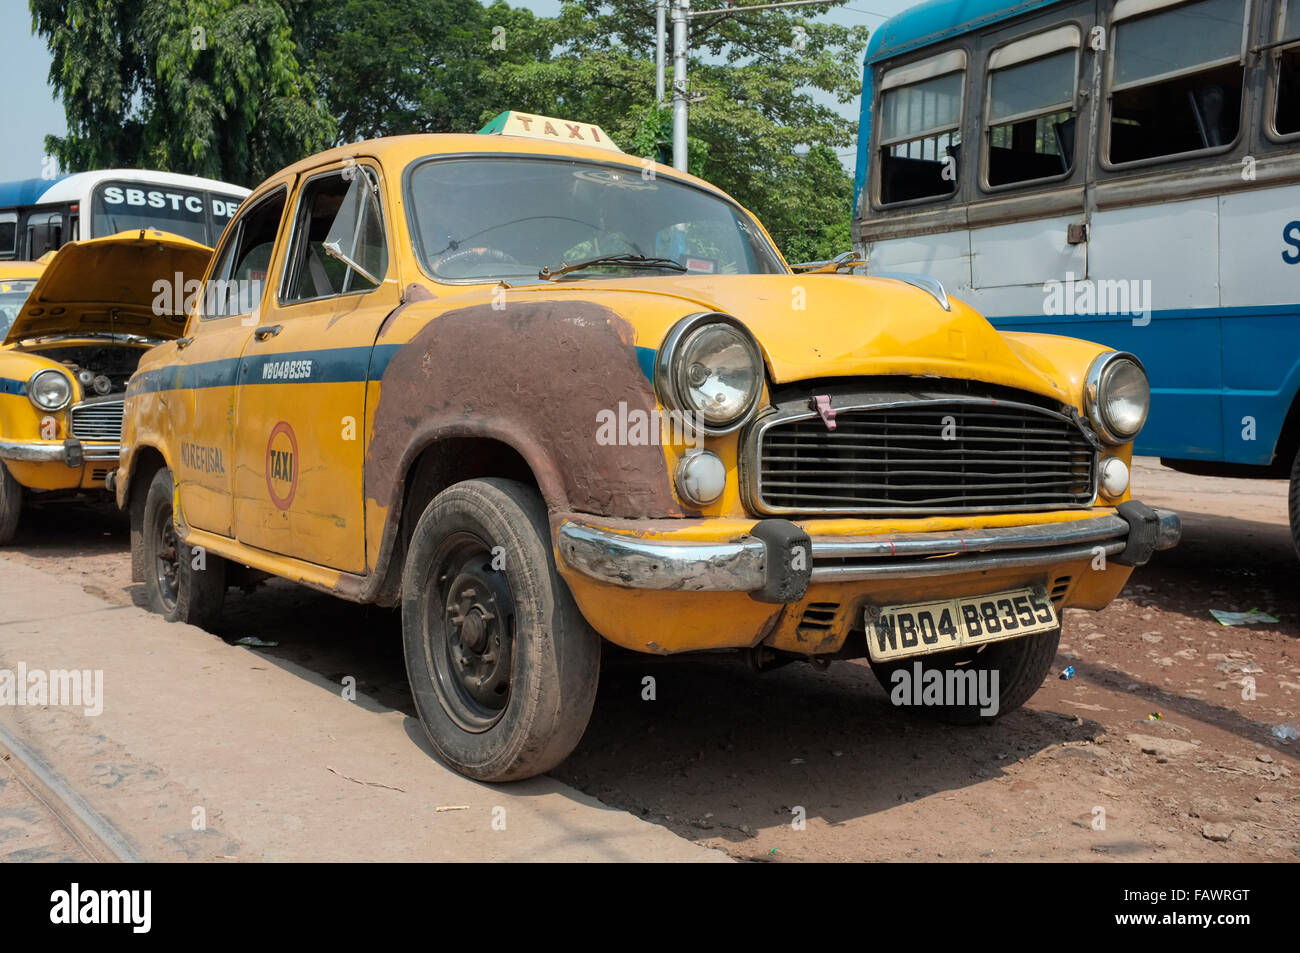 A Hindustan Ambassador taxi, Kolkata (Calcutta), West Bengal, India. - Stock Image